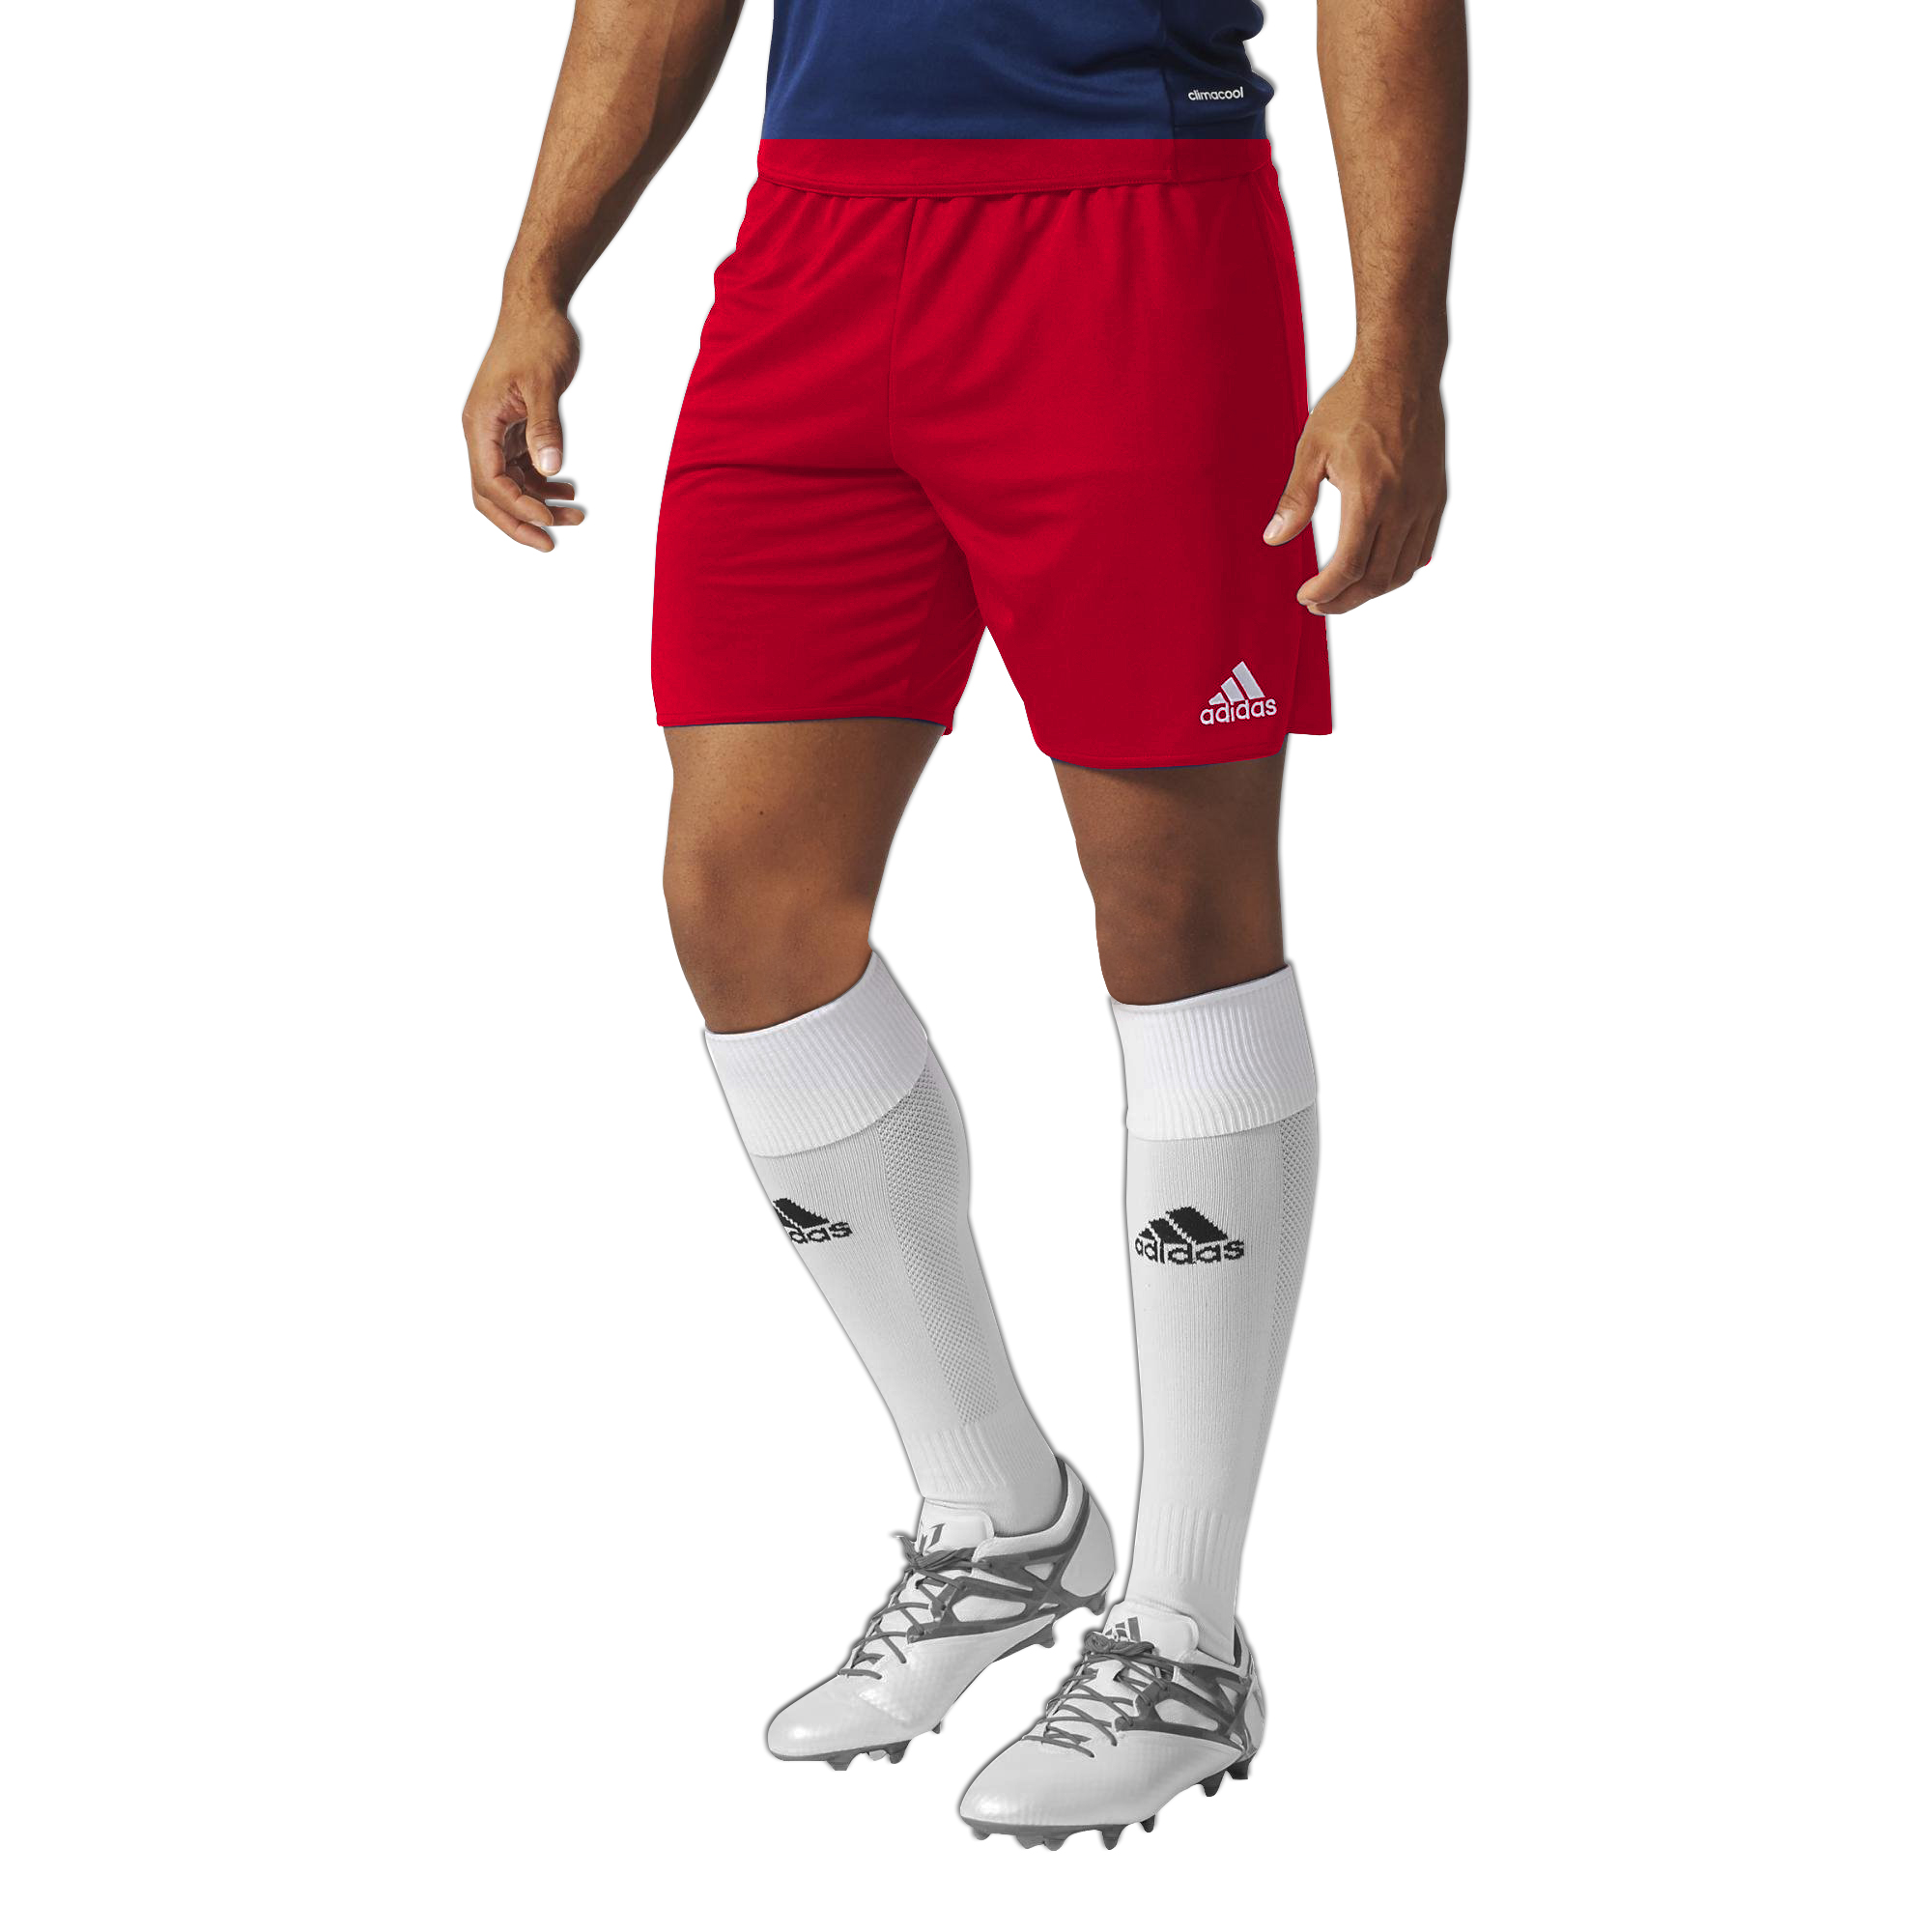 adidas-Men-039-s-Parma-Football-Training-Team-Wear-Shorts-Sport-Casual-Gym-B-Grade thumbnail 6